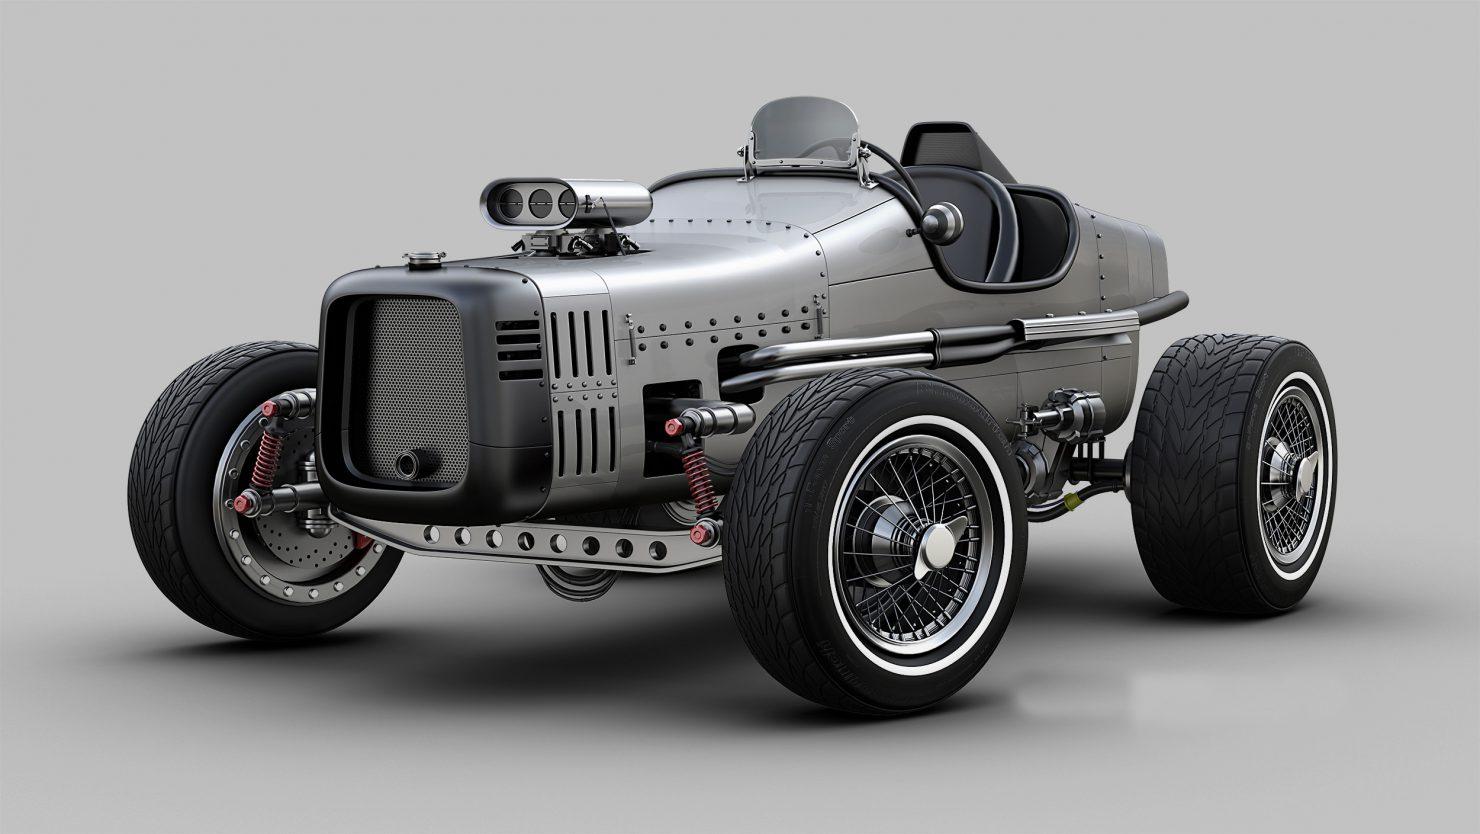 BONEVILLE HOT ROD 1480x834 - The Vehicles of Jomar Machado